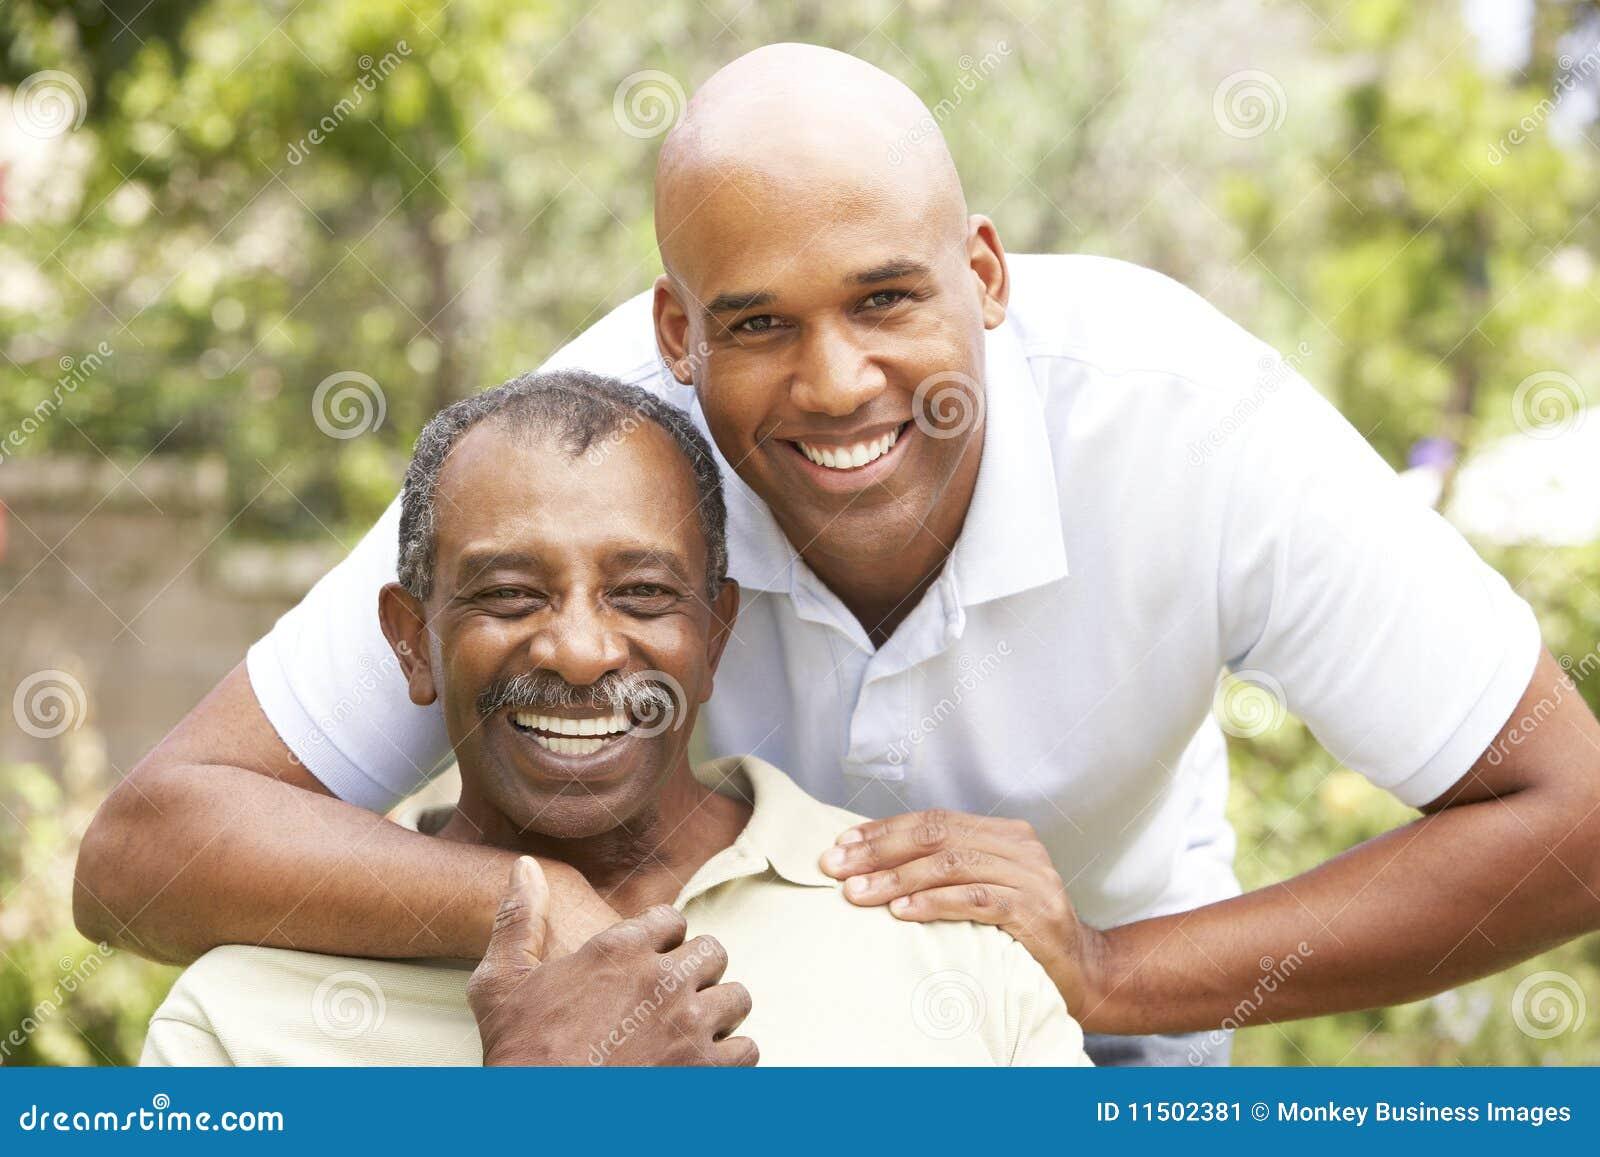 Älterer Mann, der erwachsenen Sohn umarmt